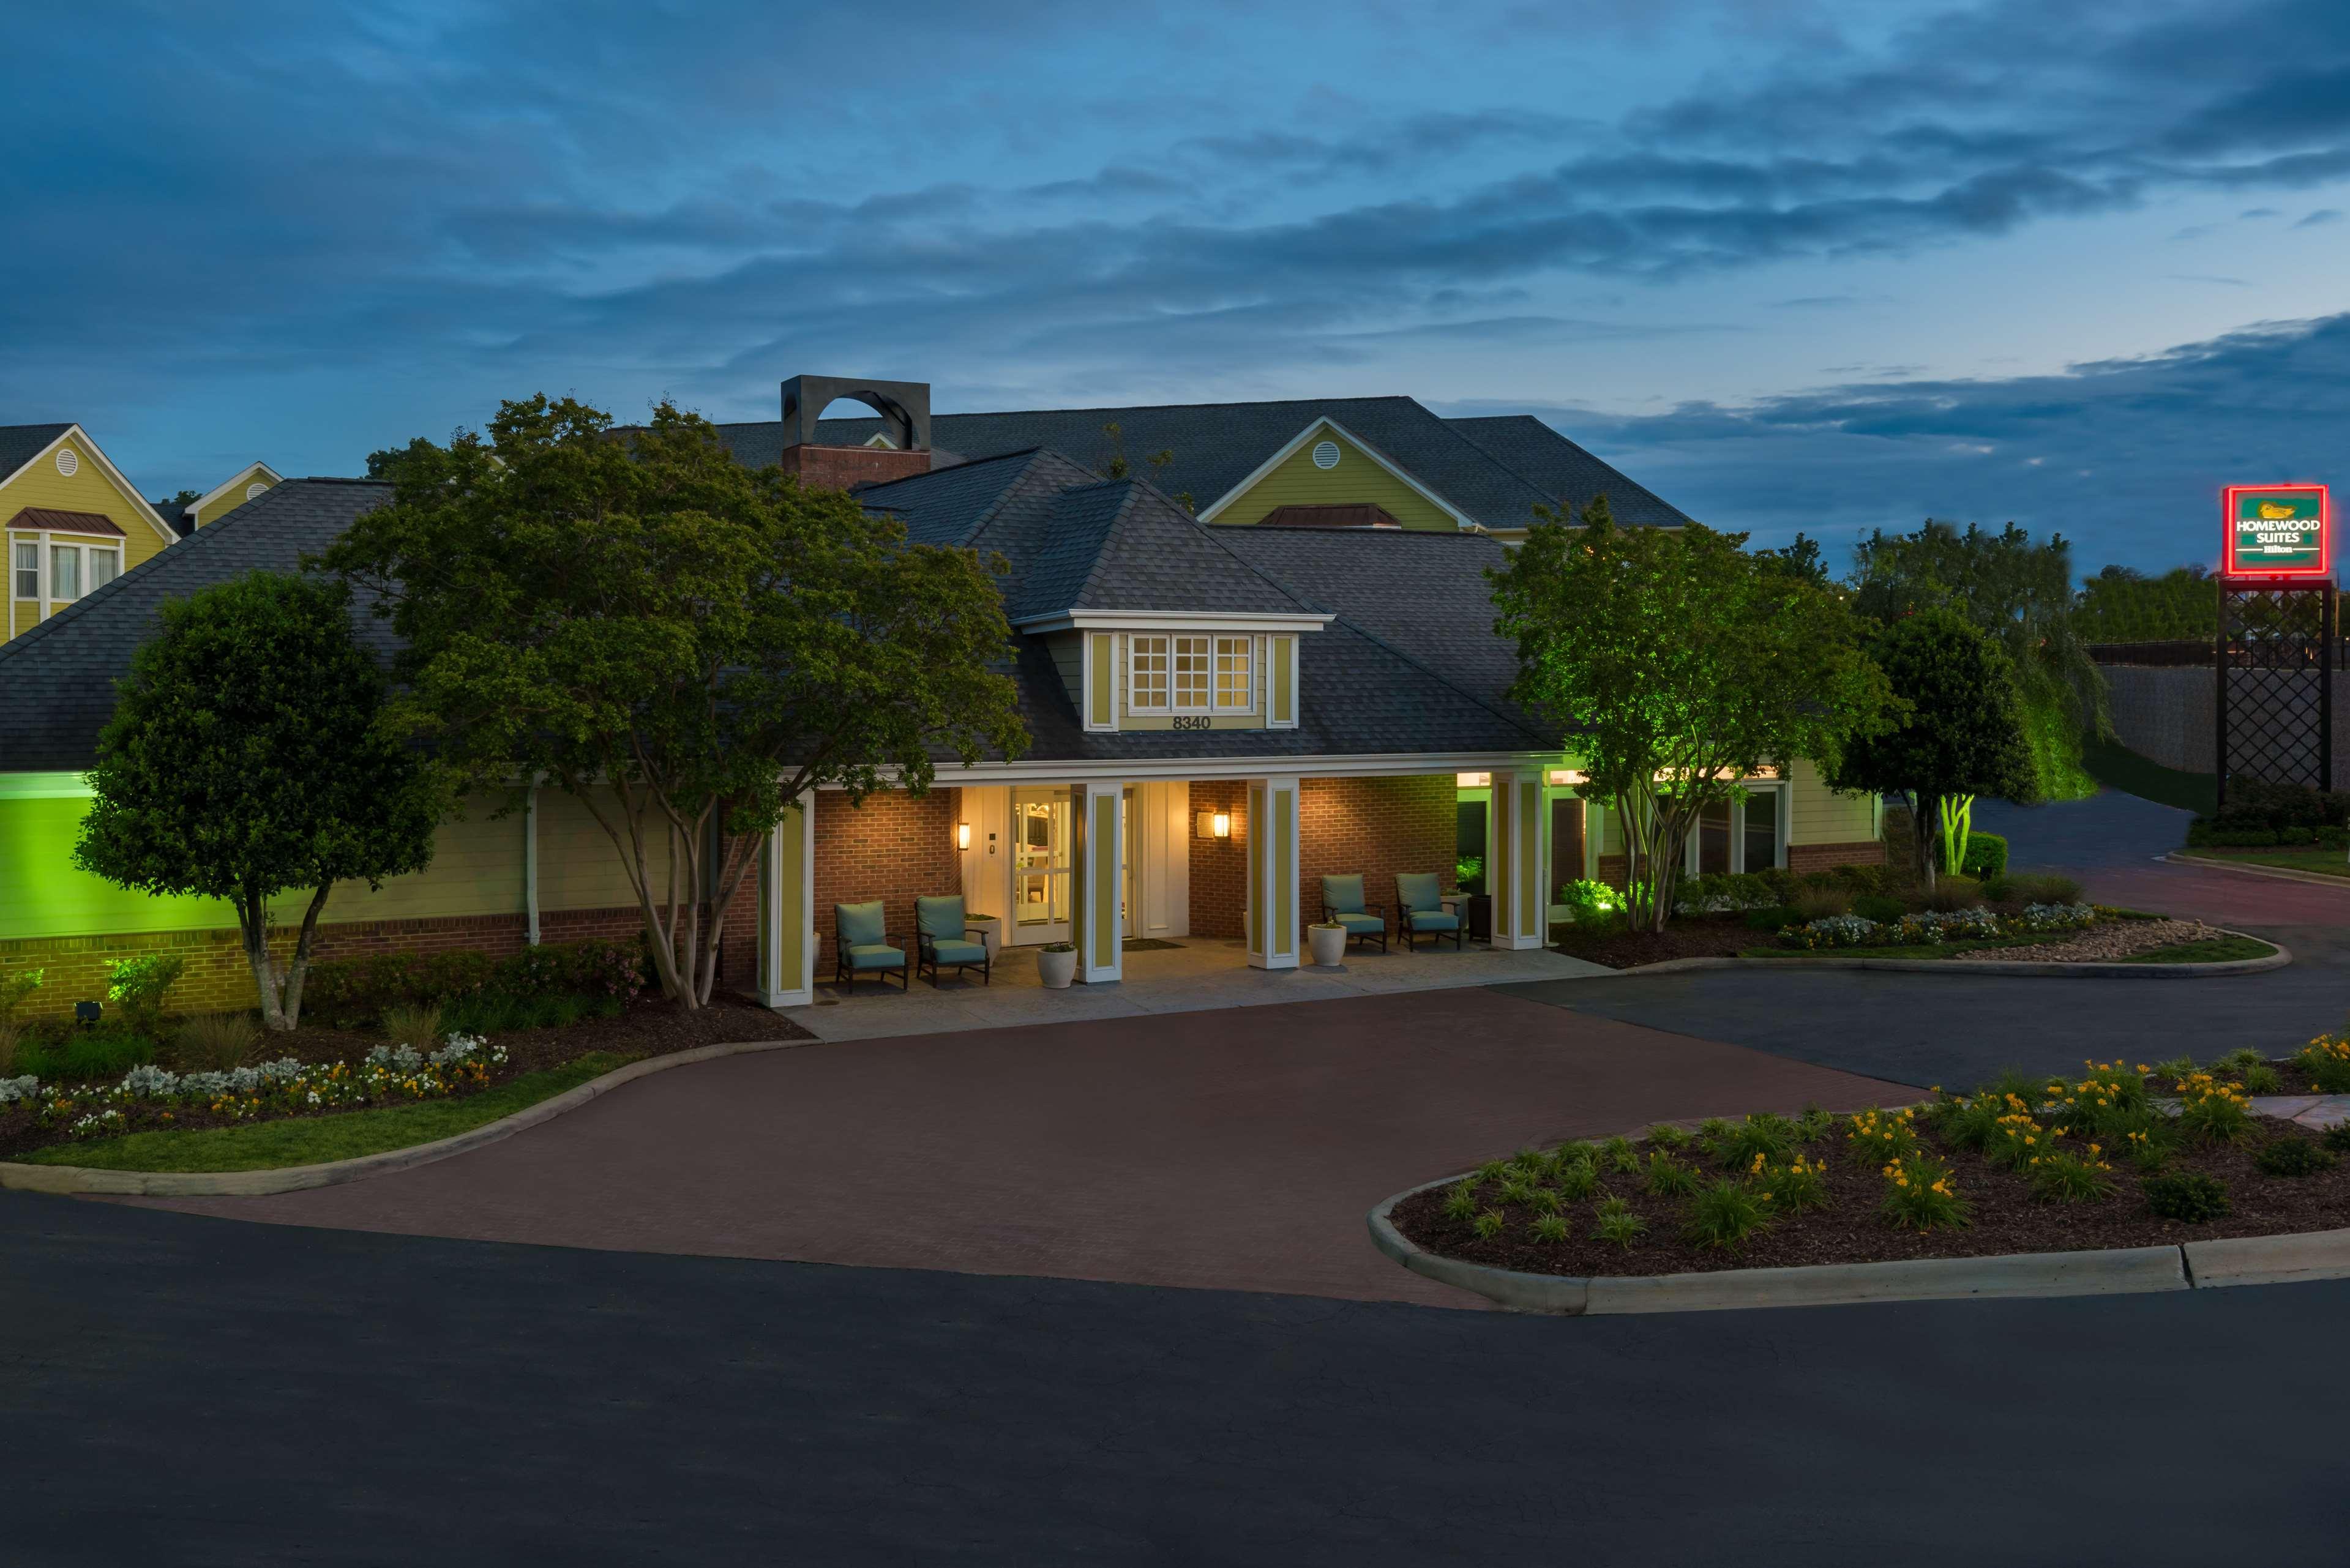 Homewood Suites by Hilton Charlotte-North/Univ Research Park image 0